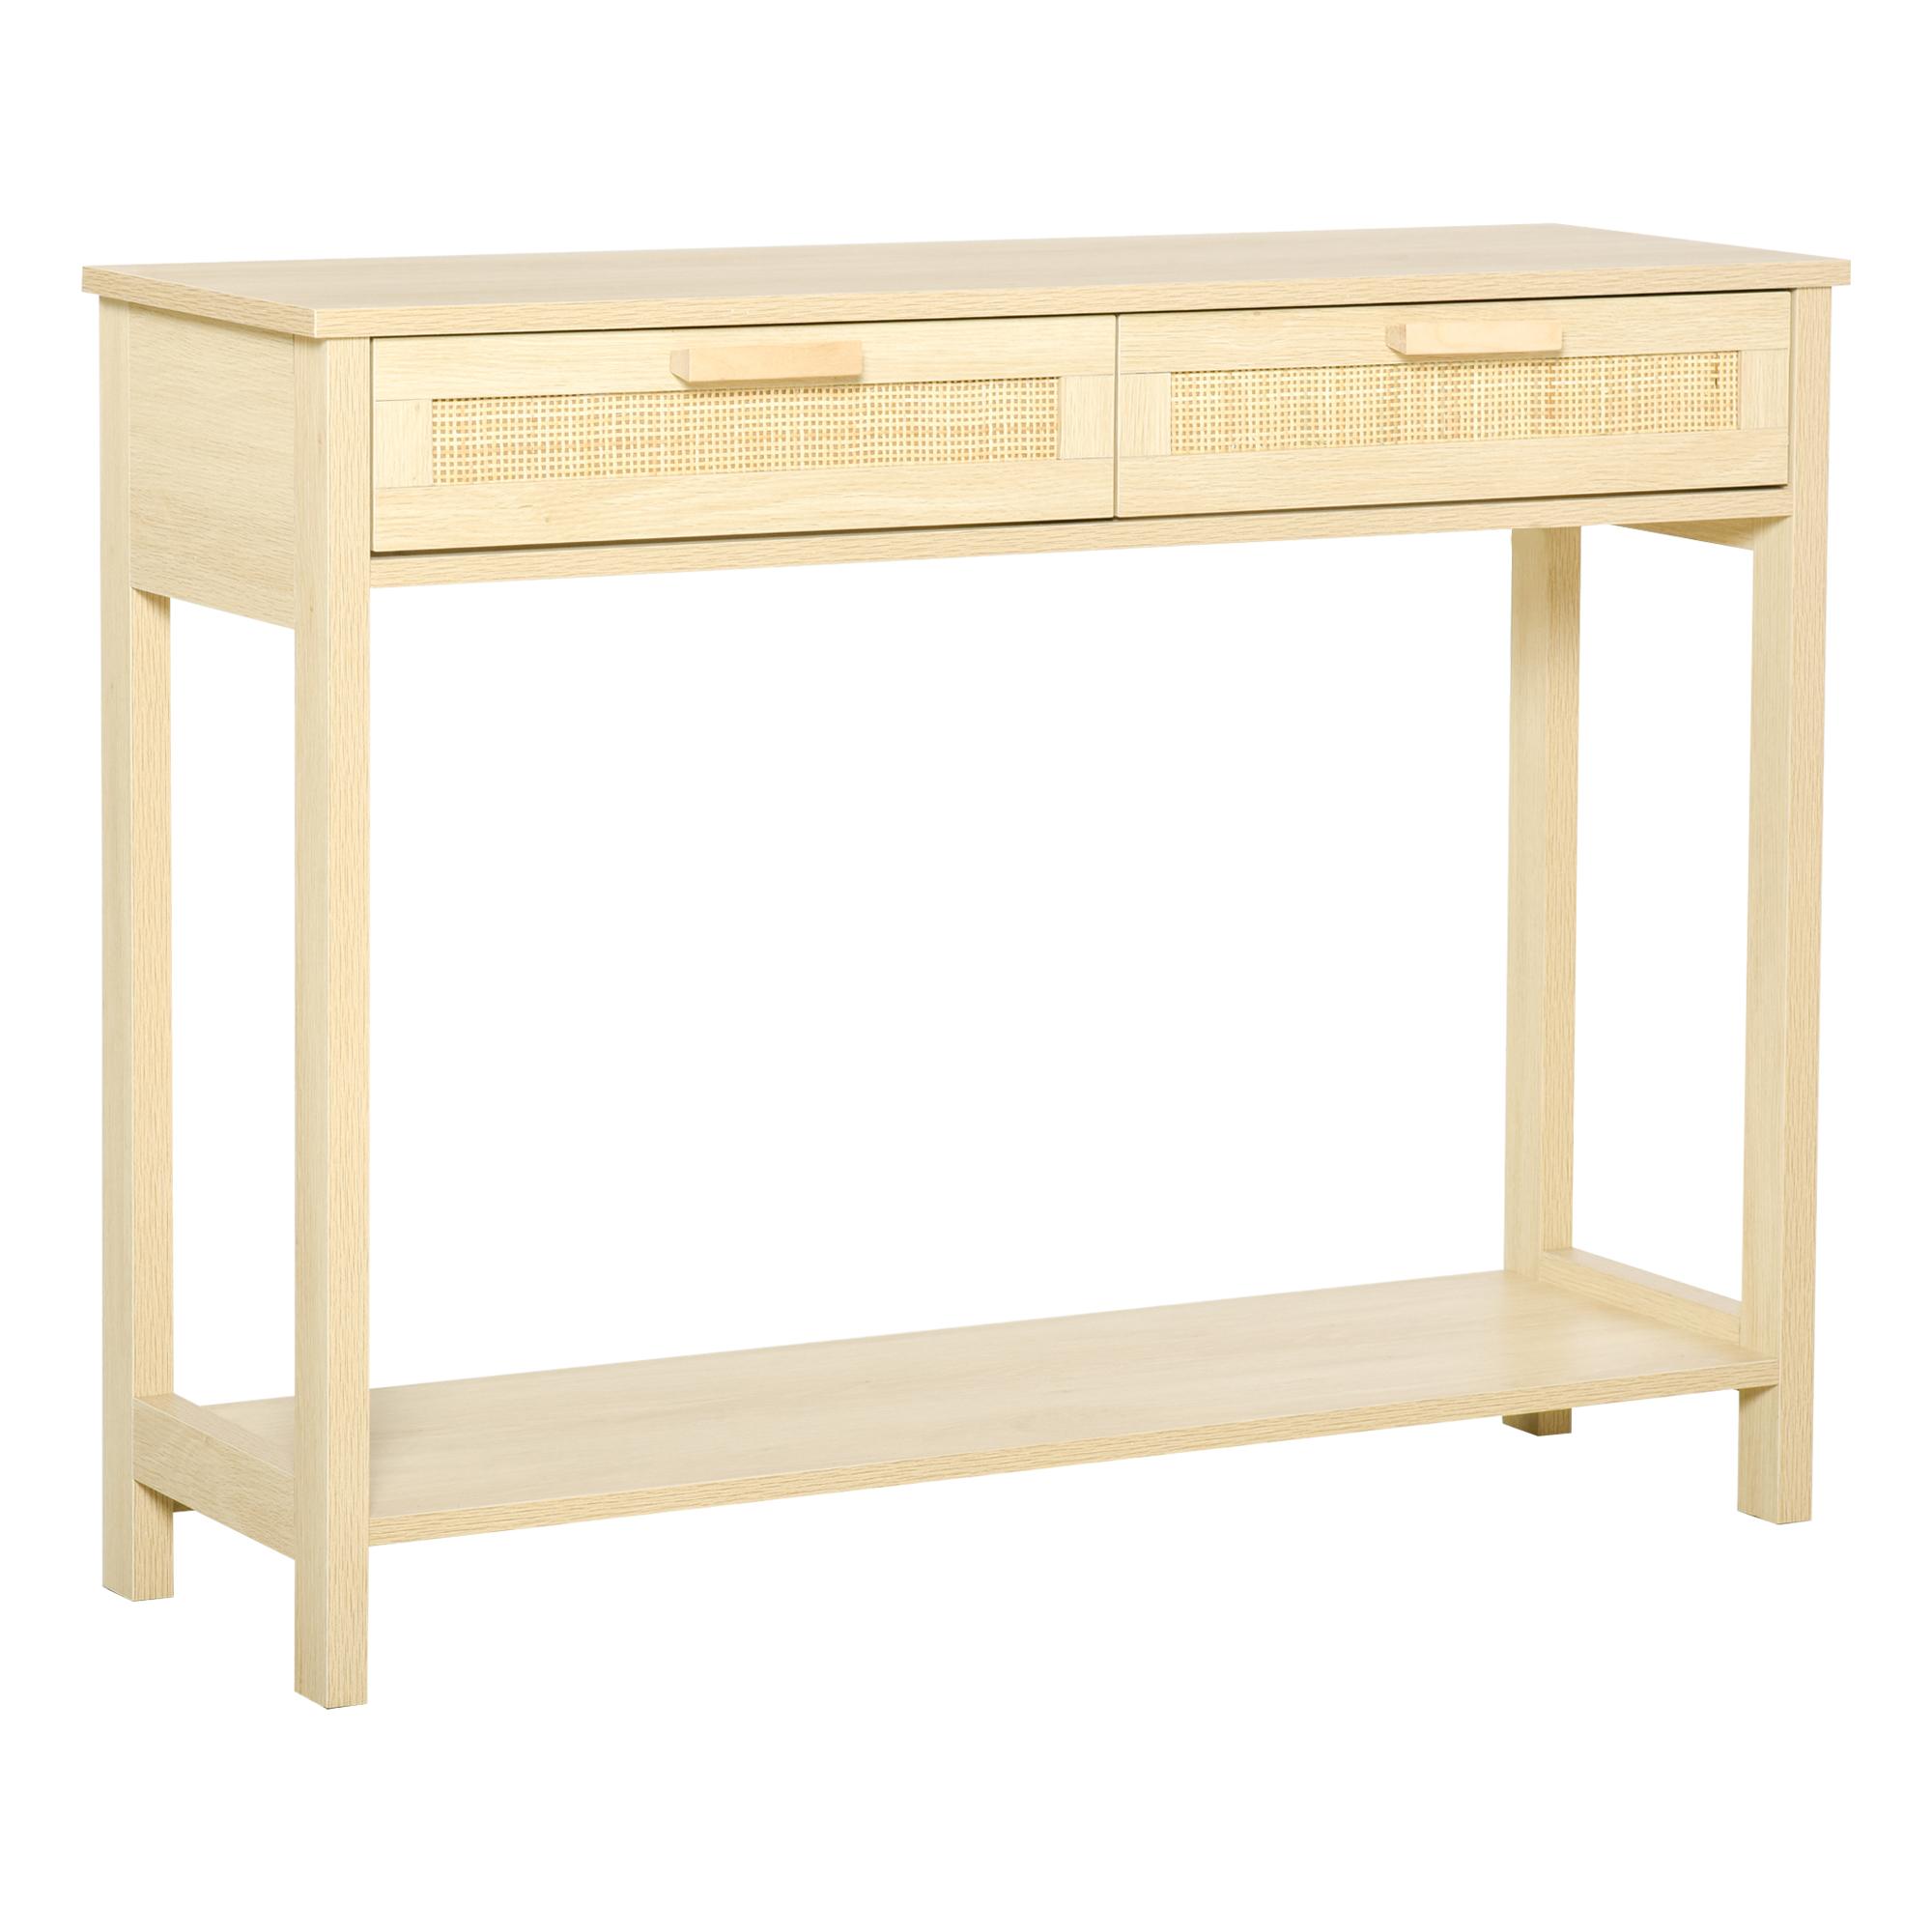 Console 2 tiroirs façades cannage en rotin étagère aspect bois clair